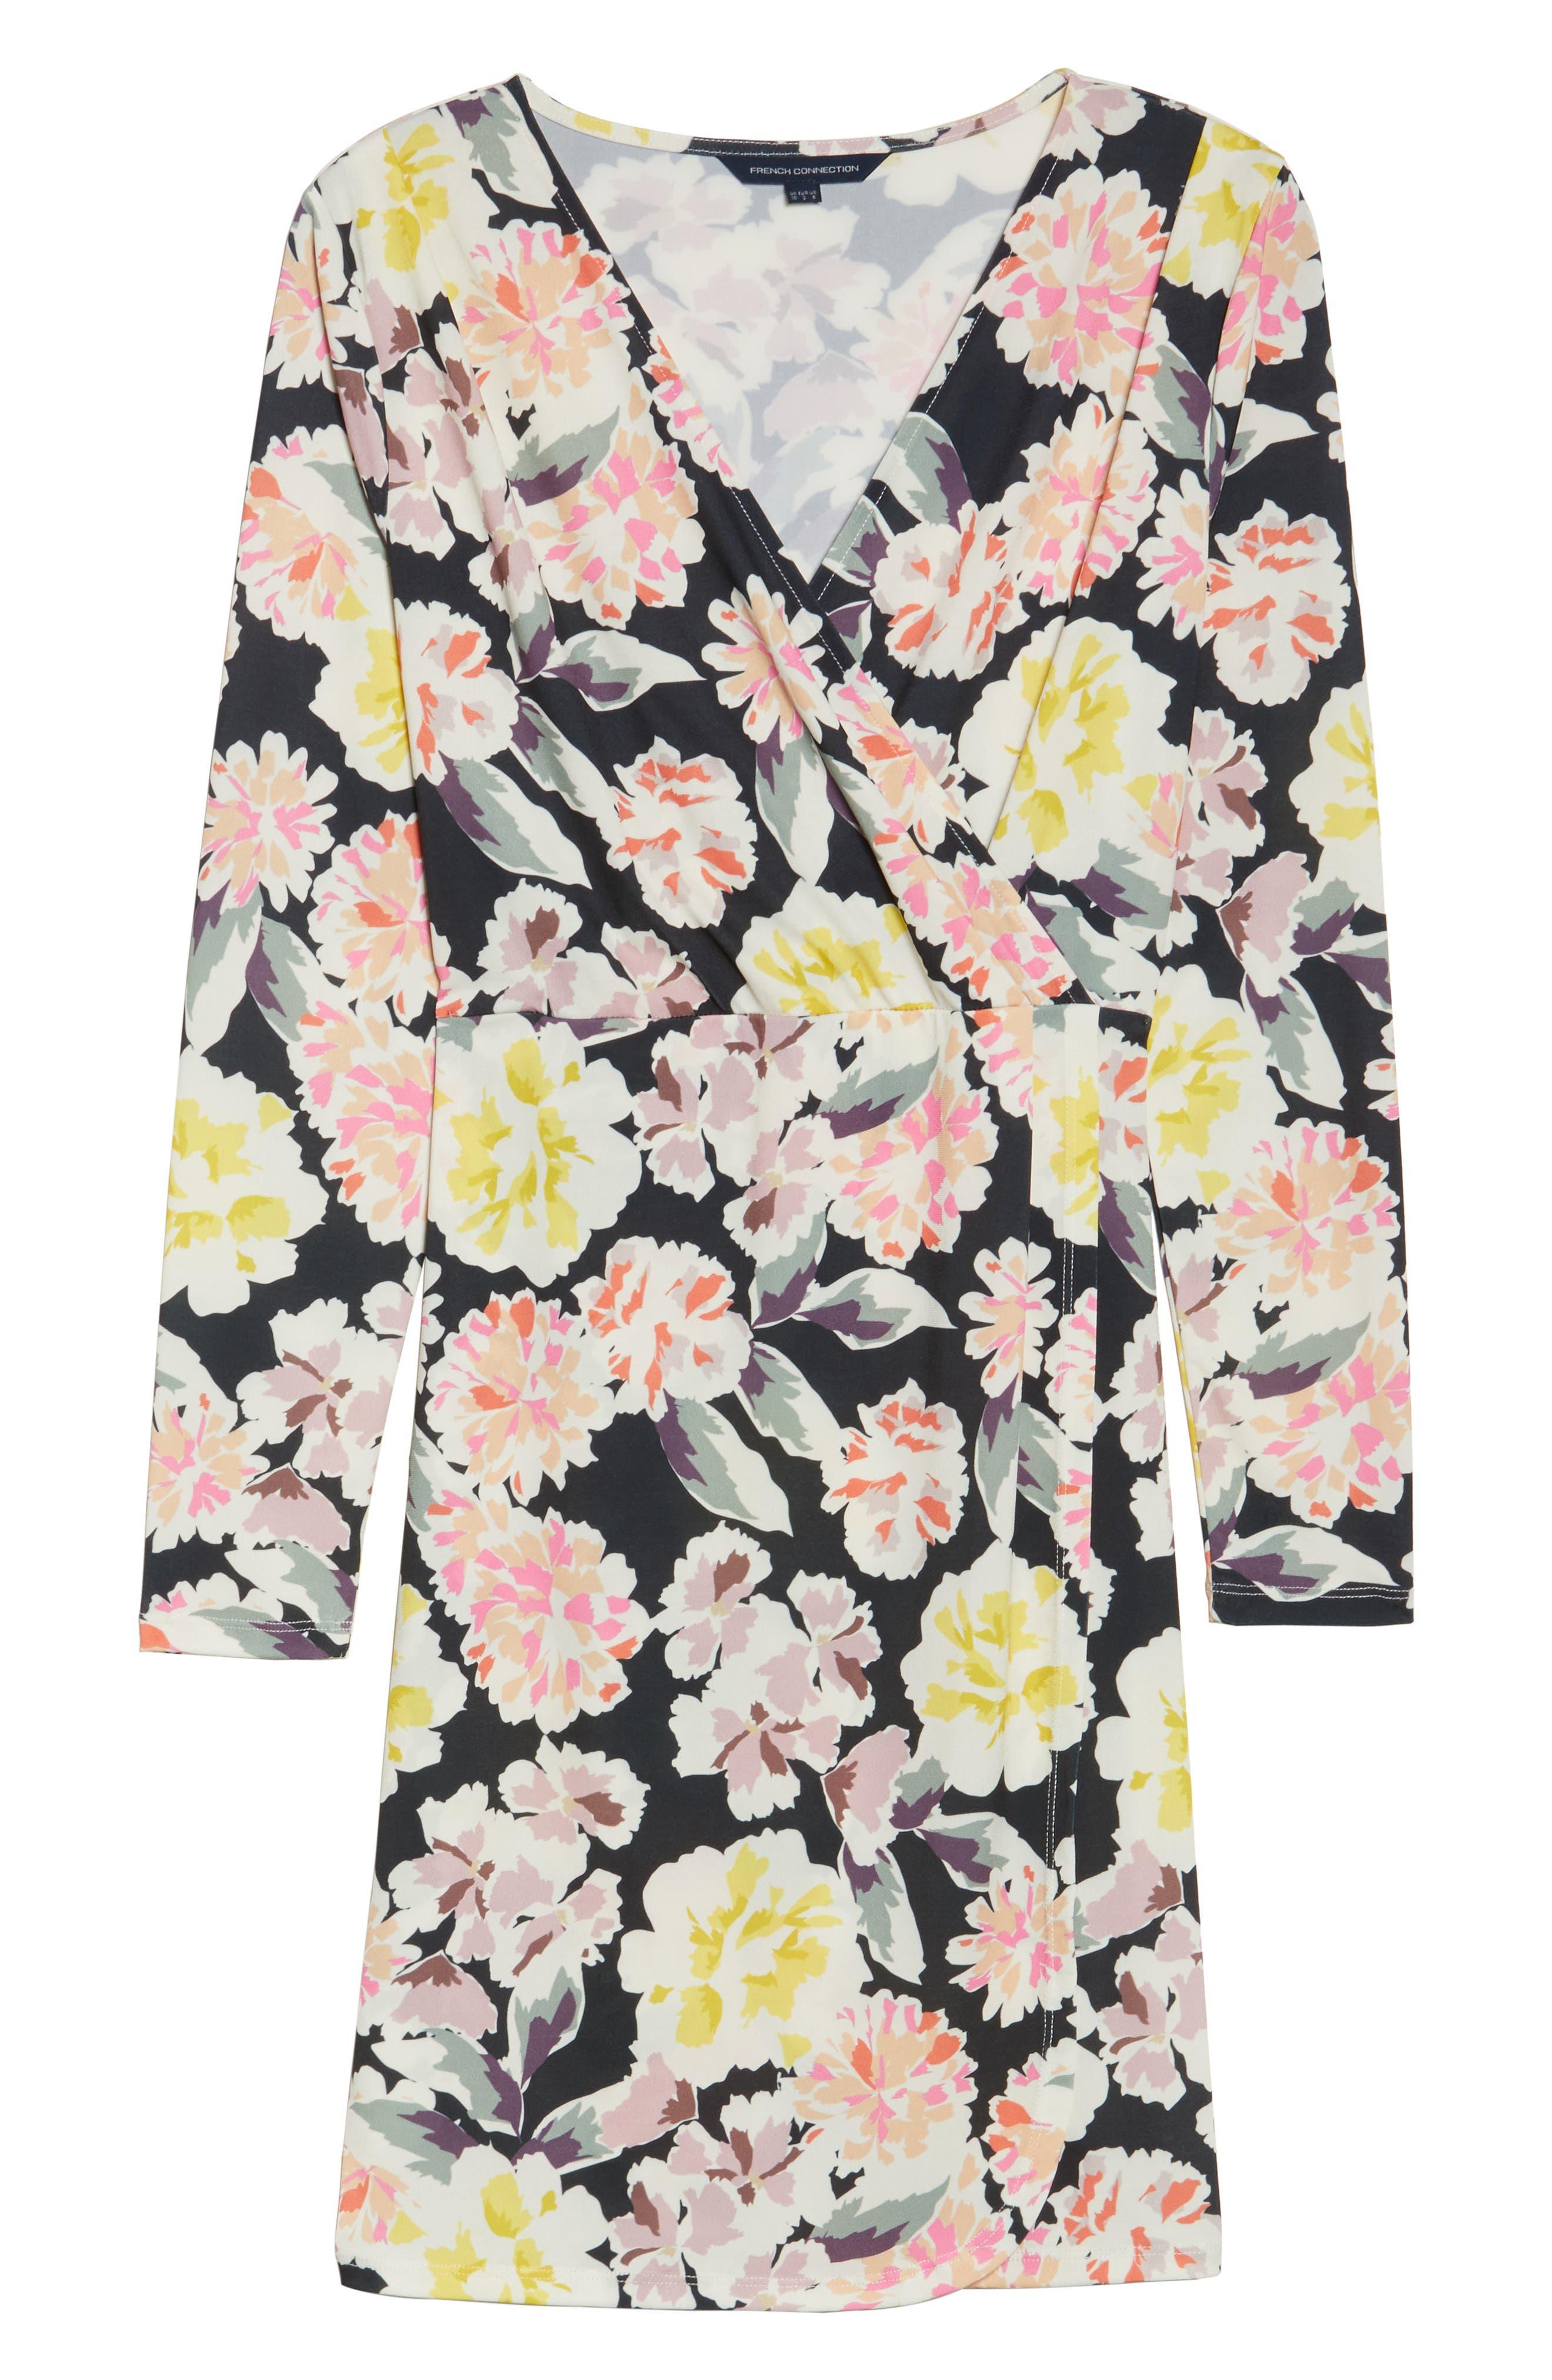 Enoshima Sheath Dress,                             Alternate thumbnail 6, color,                             004